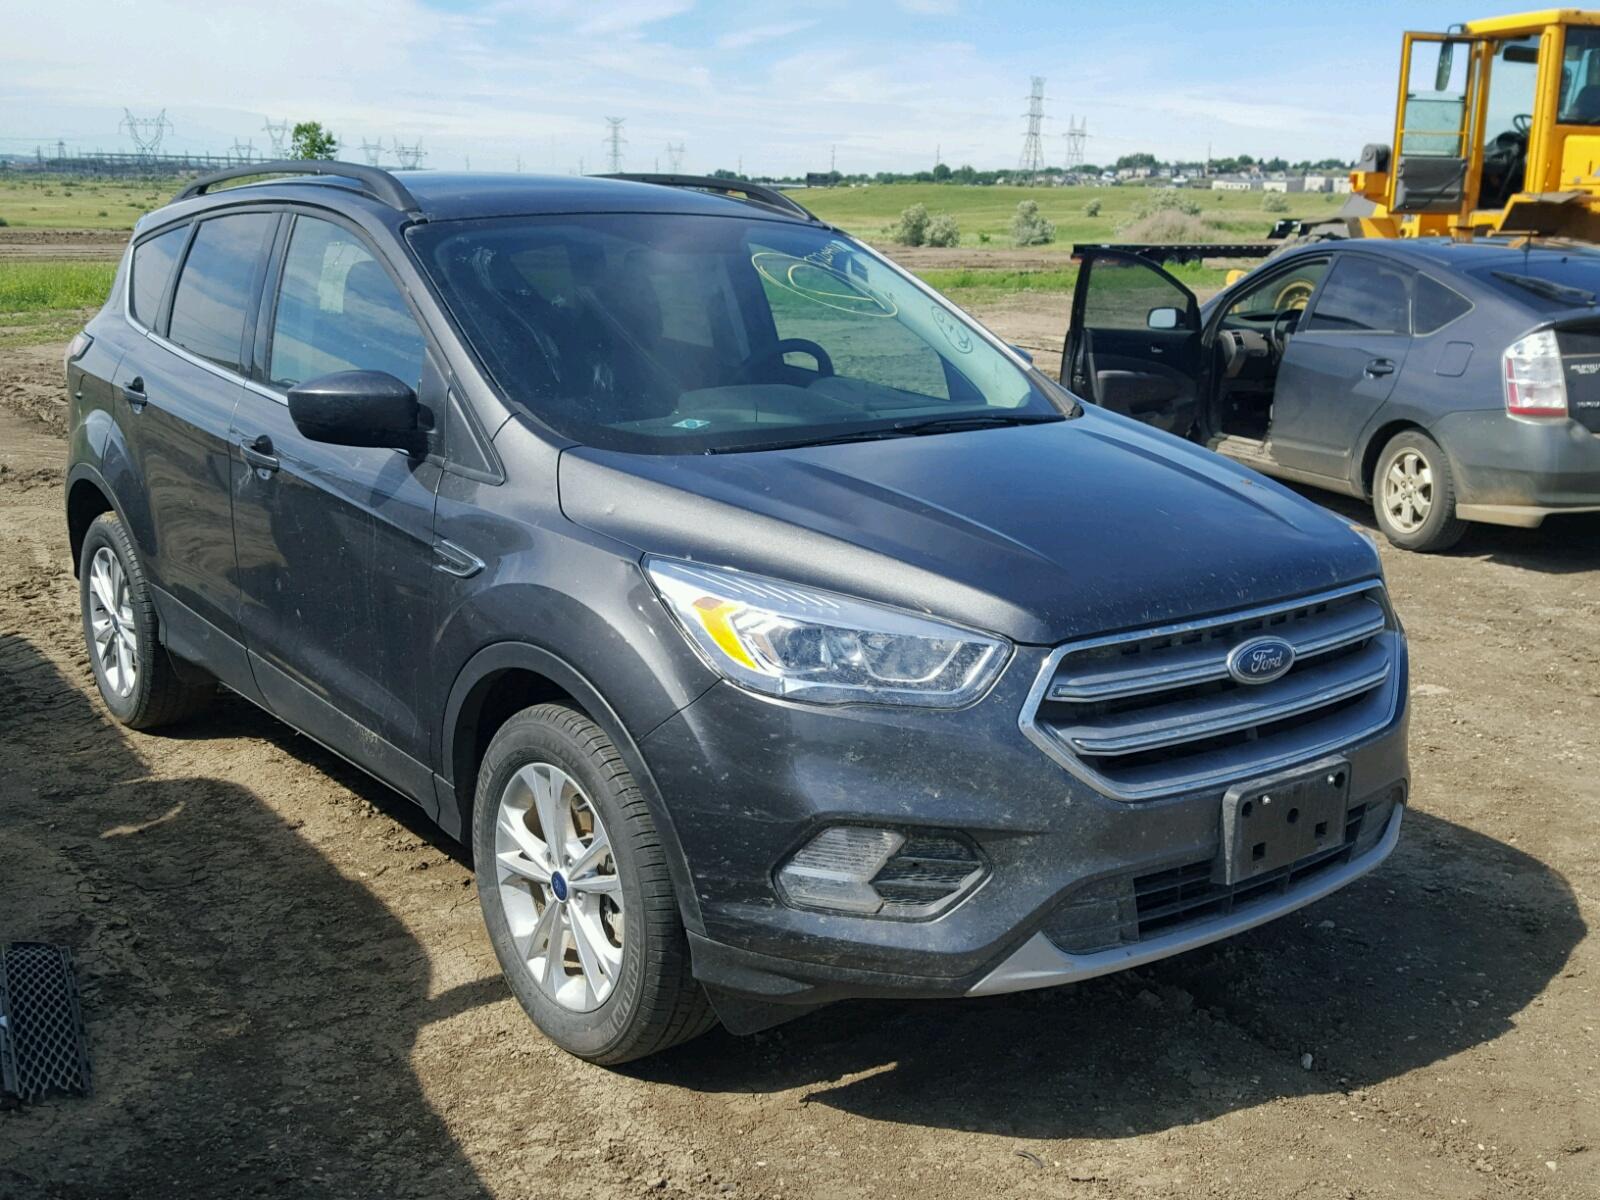 2017 Ford Escape SE for sale at Copart Billings MT Lot